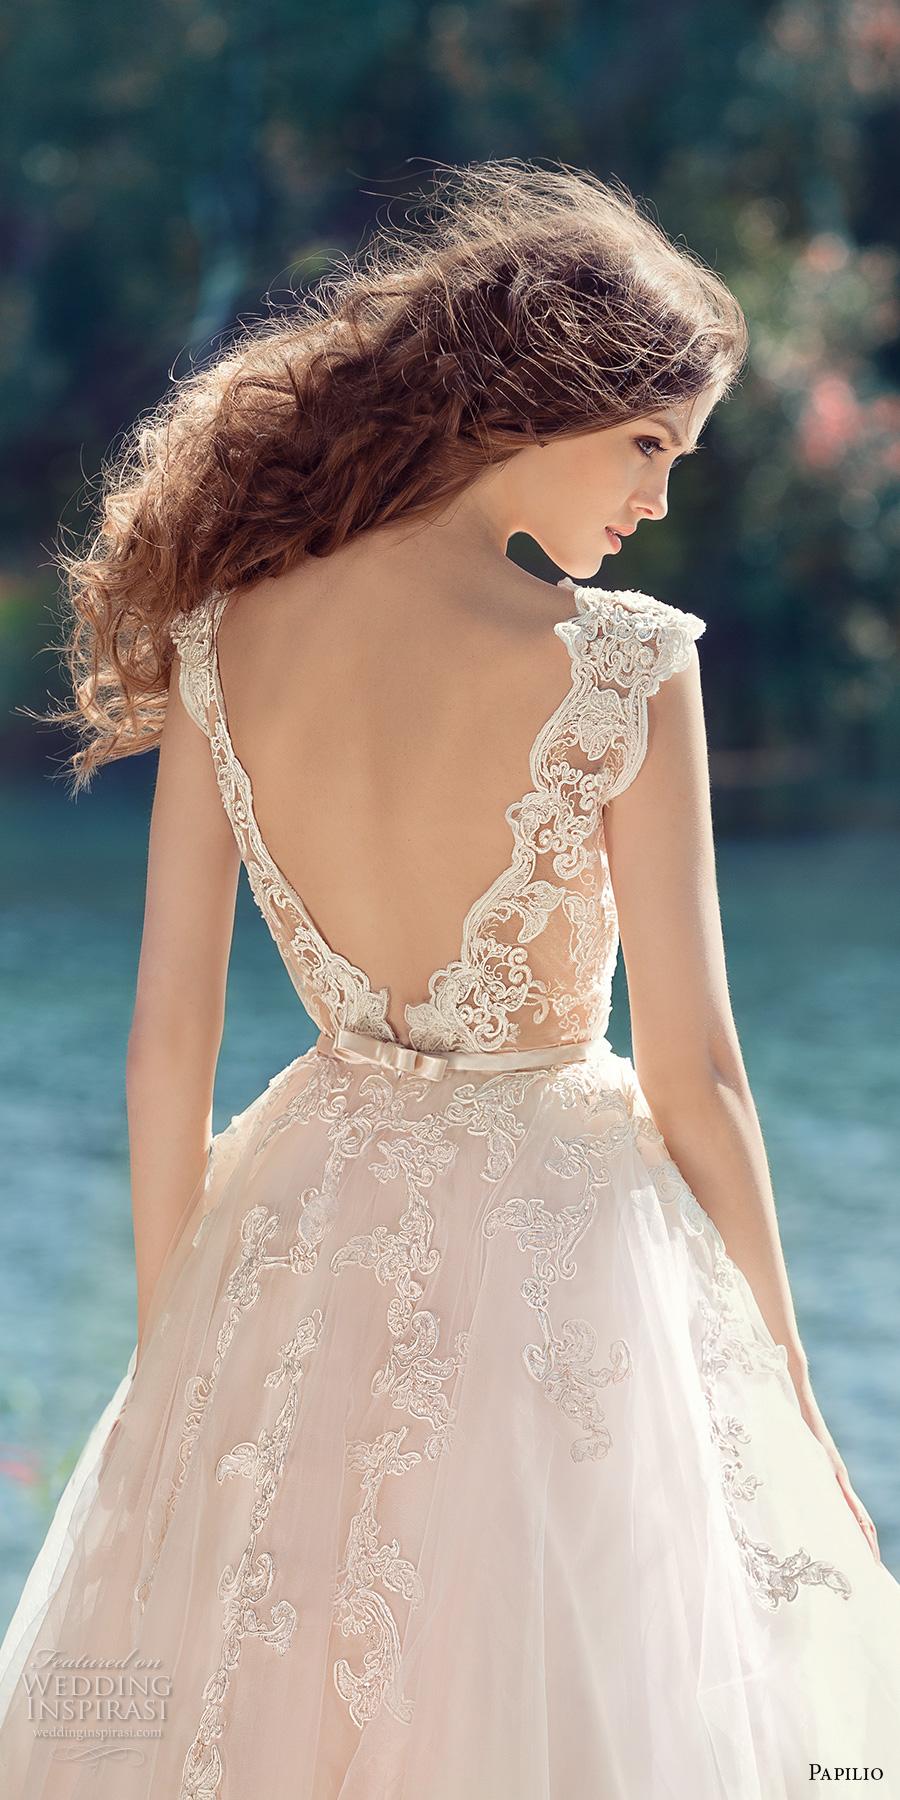 papilio 2017 bridal cap sleeves v neck heavily embellished bodice tulle skirt romantic blush color a line wedding dress open low v back royal train (hornbill) zbv